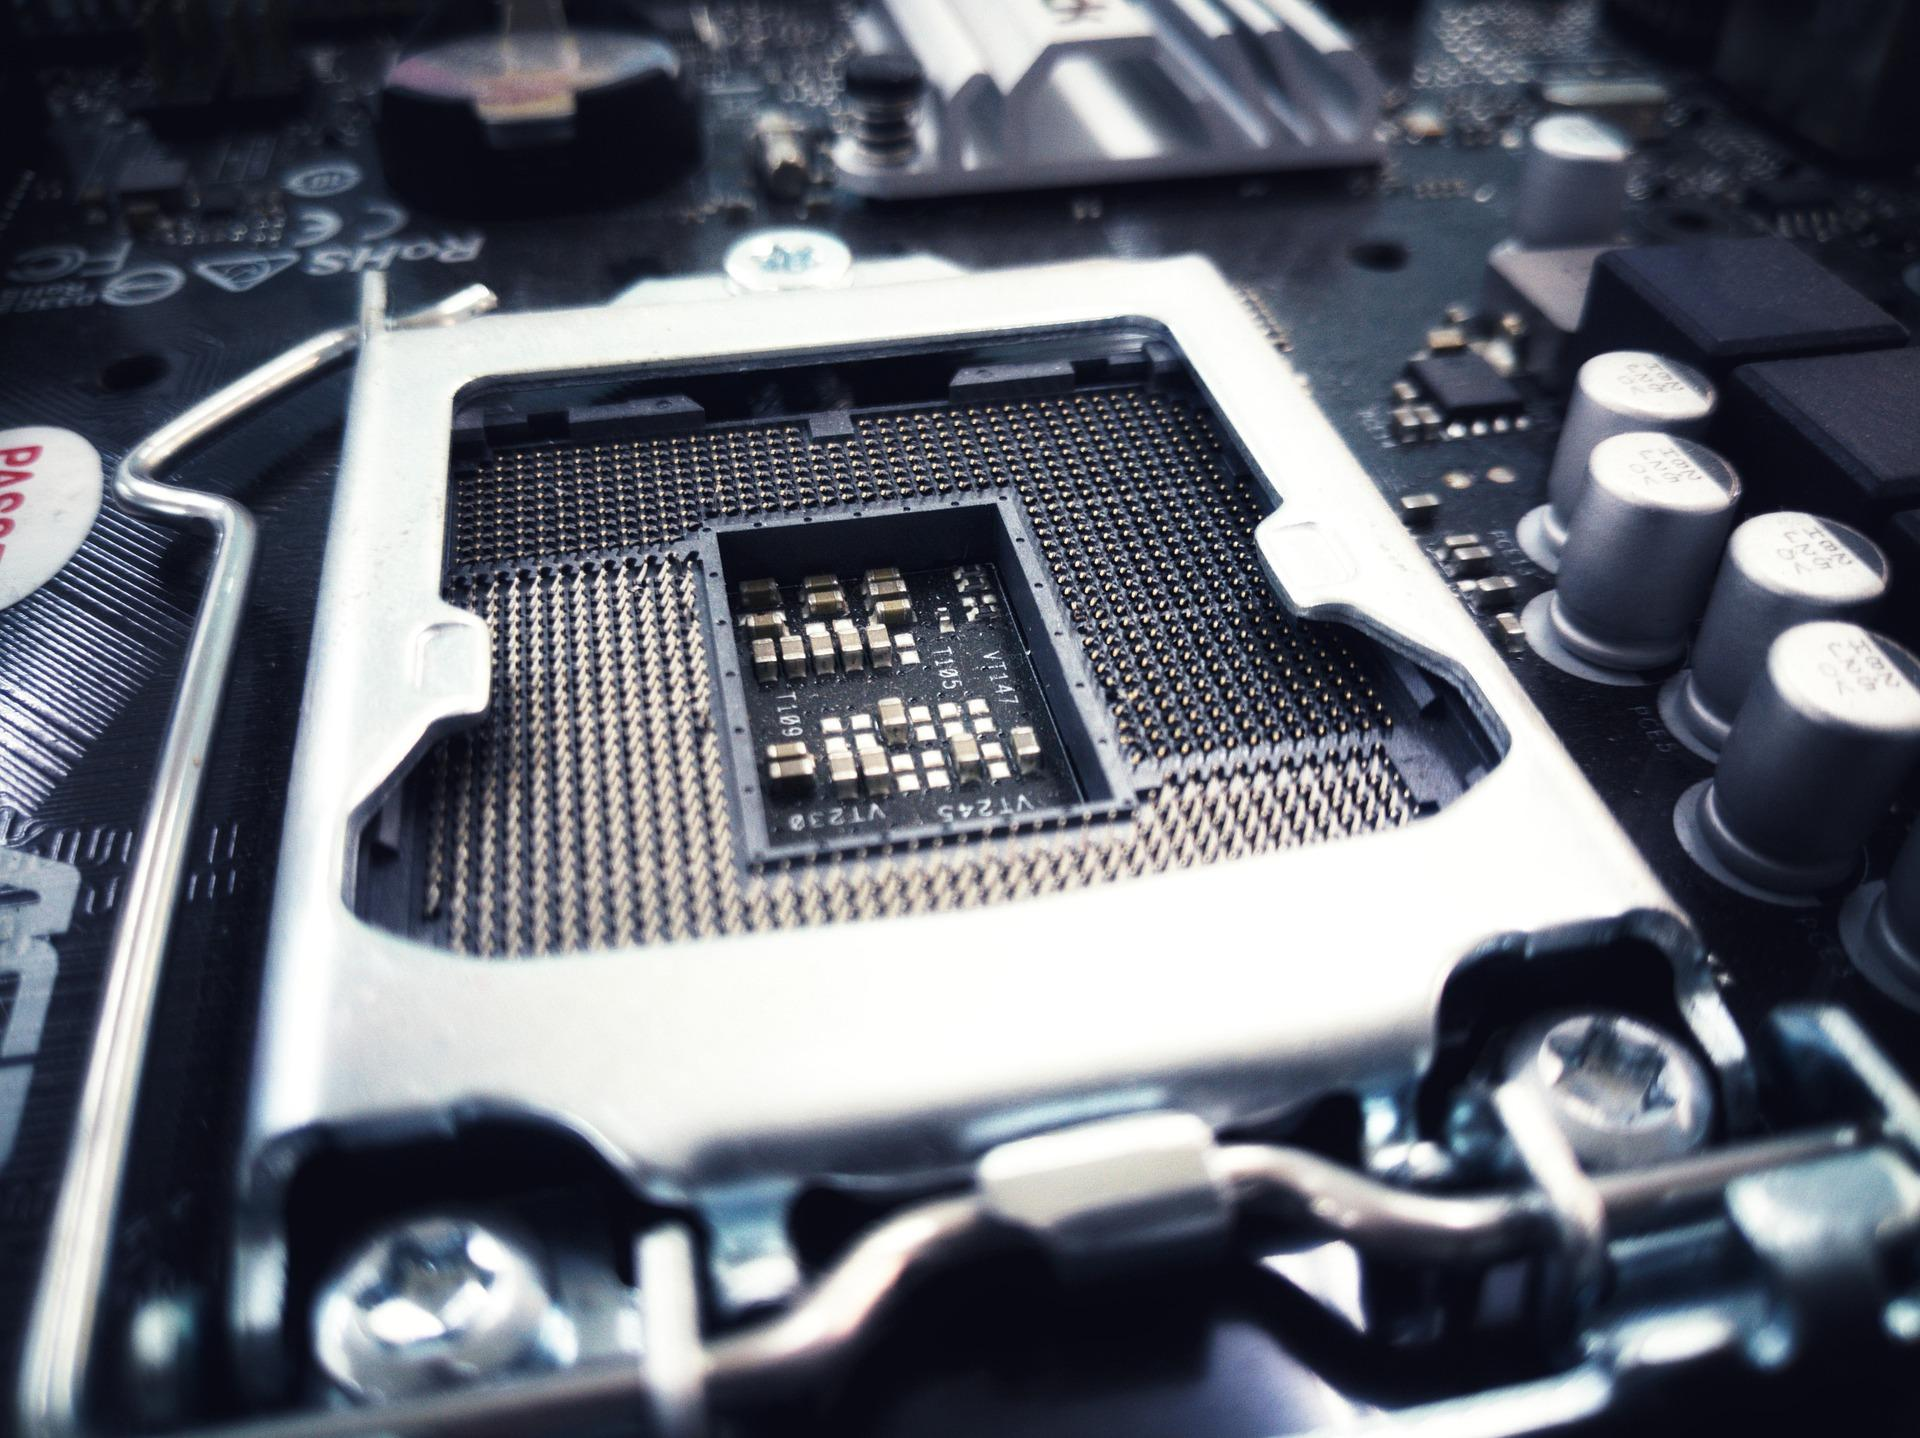 Результаты новых тестов процессоров IntelСоrе і5-11400 иі9-11900К Rocket Lake